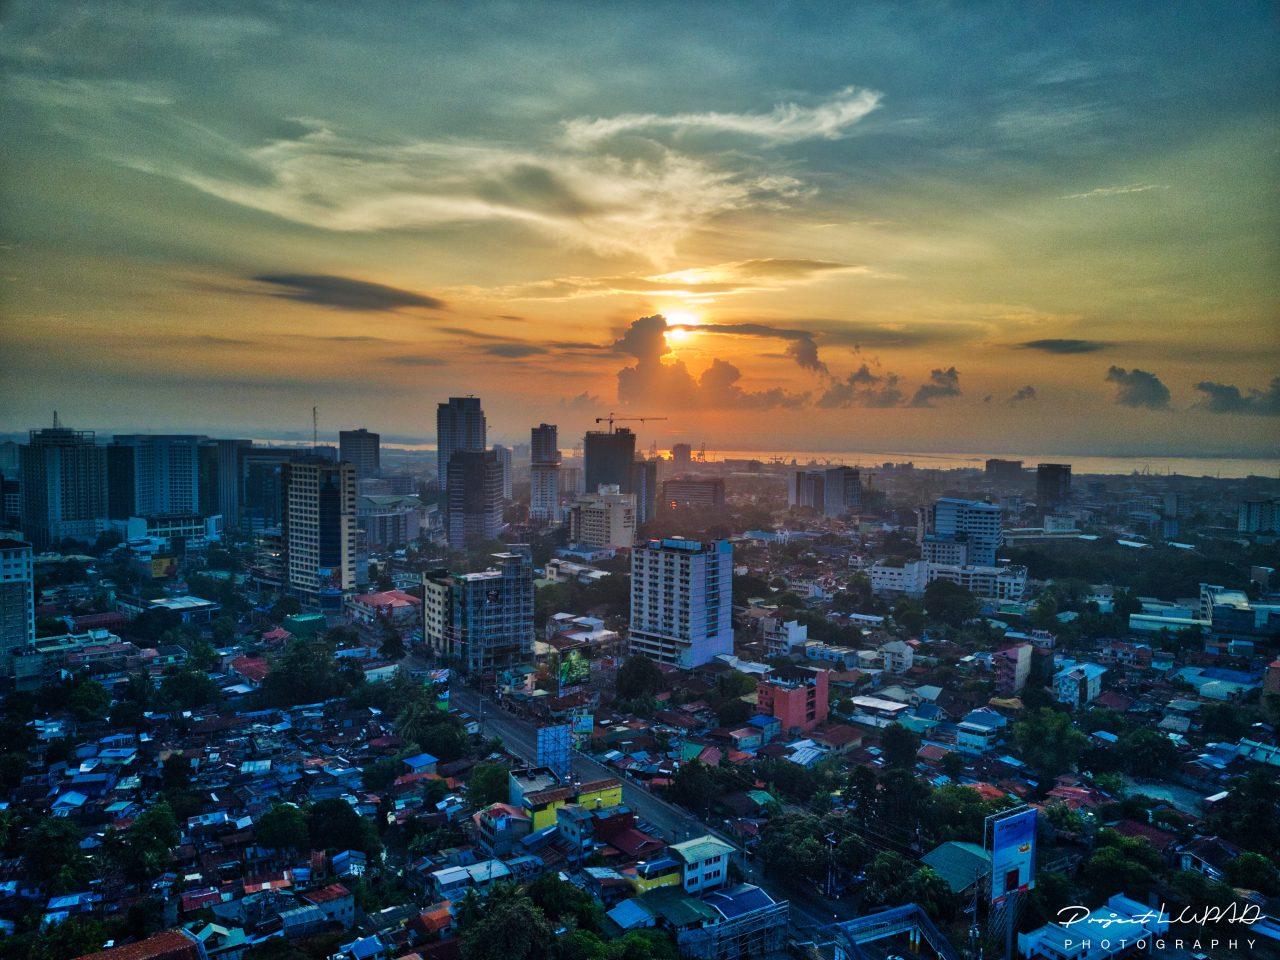 Spectacular Golden Hour Aerial View of Cebu City